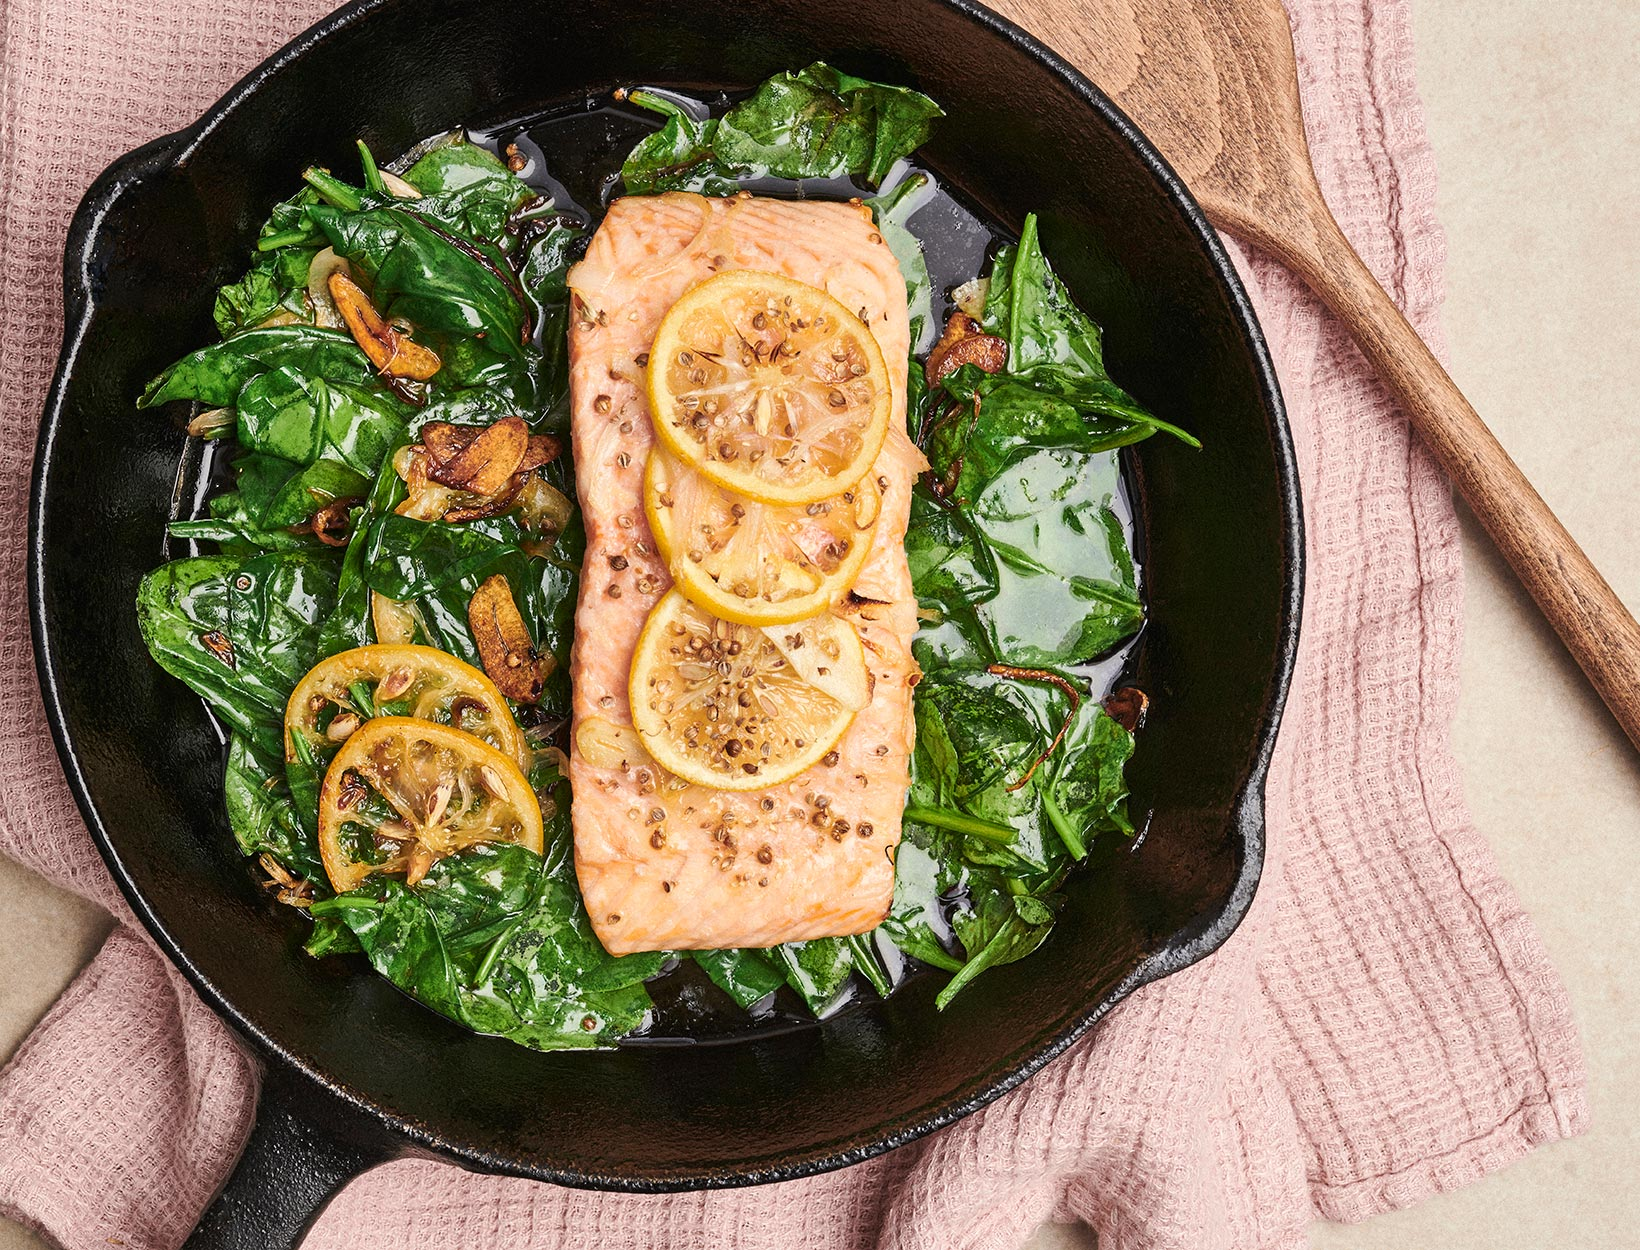 Slow-Roasted Salmon with Shallots, Garlic, Coriander, and Lemon